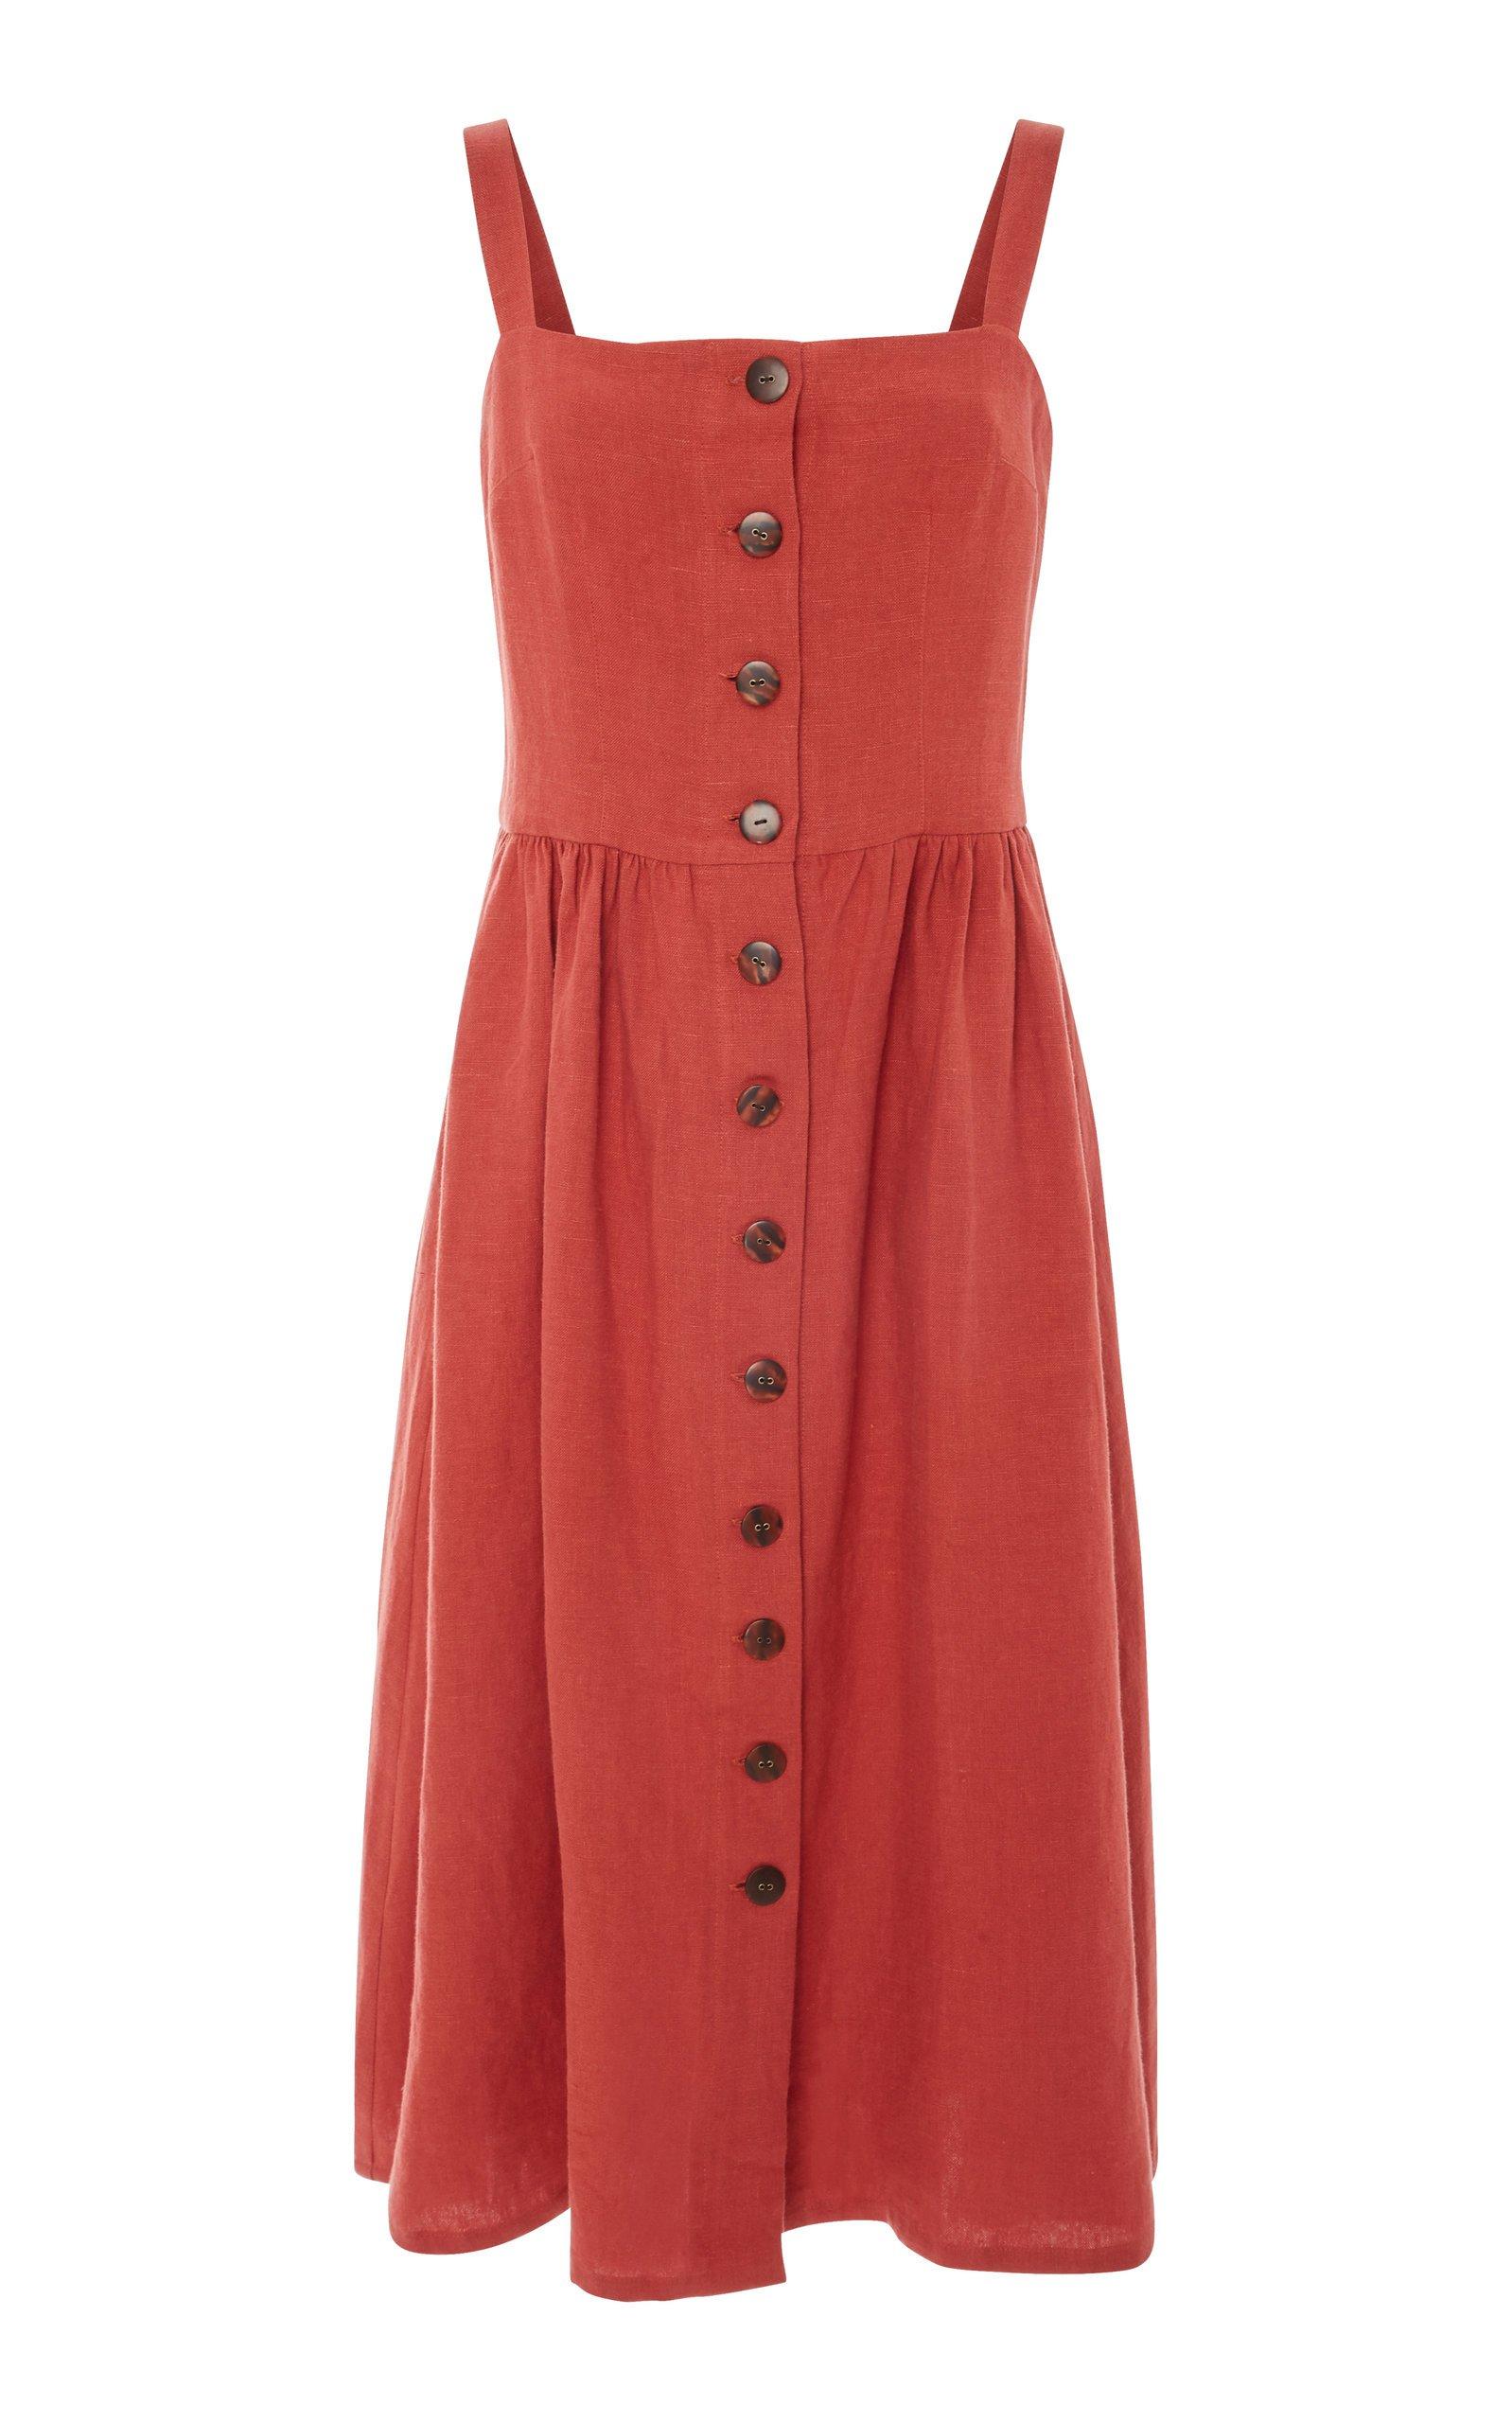 M'O Exclusive Postinon Button Front Dress by ALBUS LUMEN | Moda Operandi